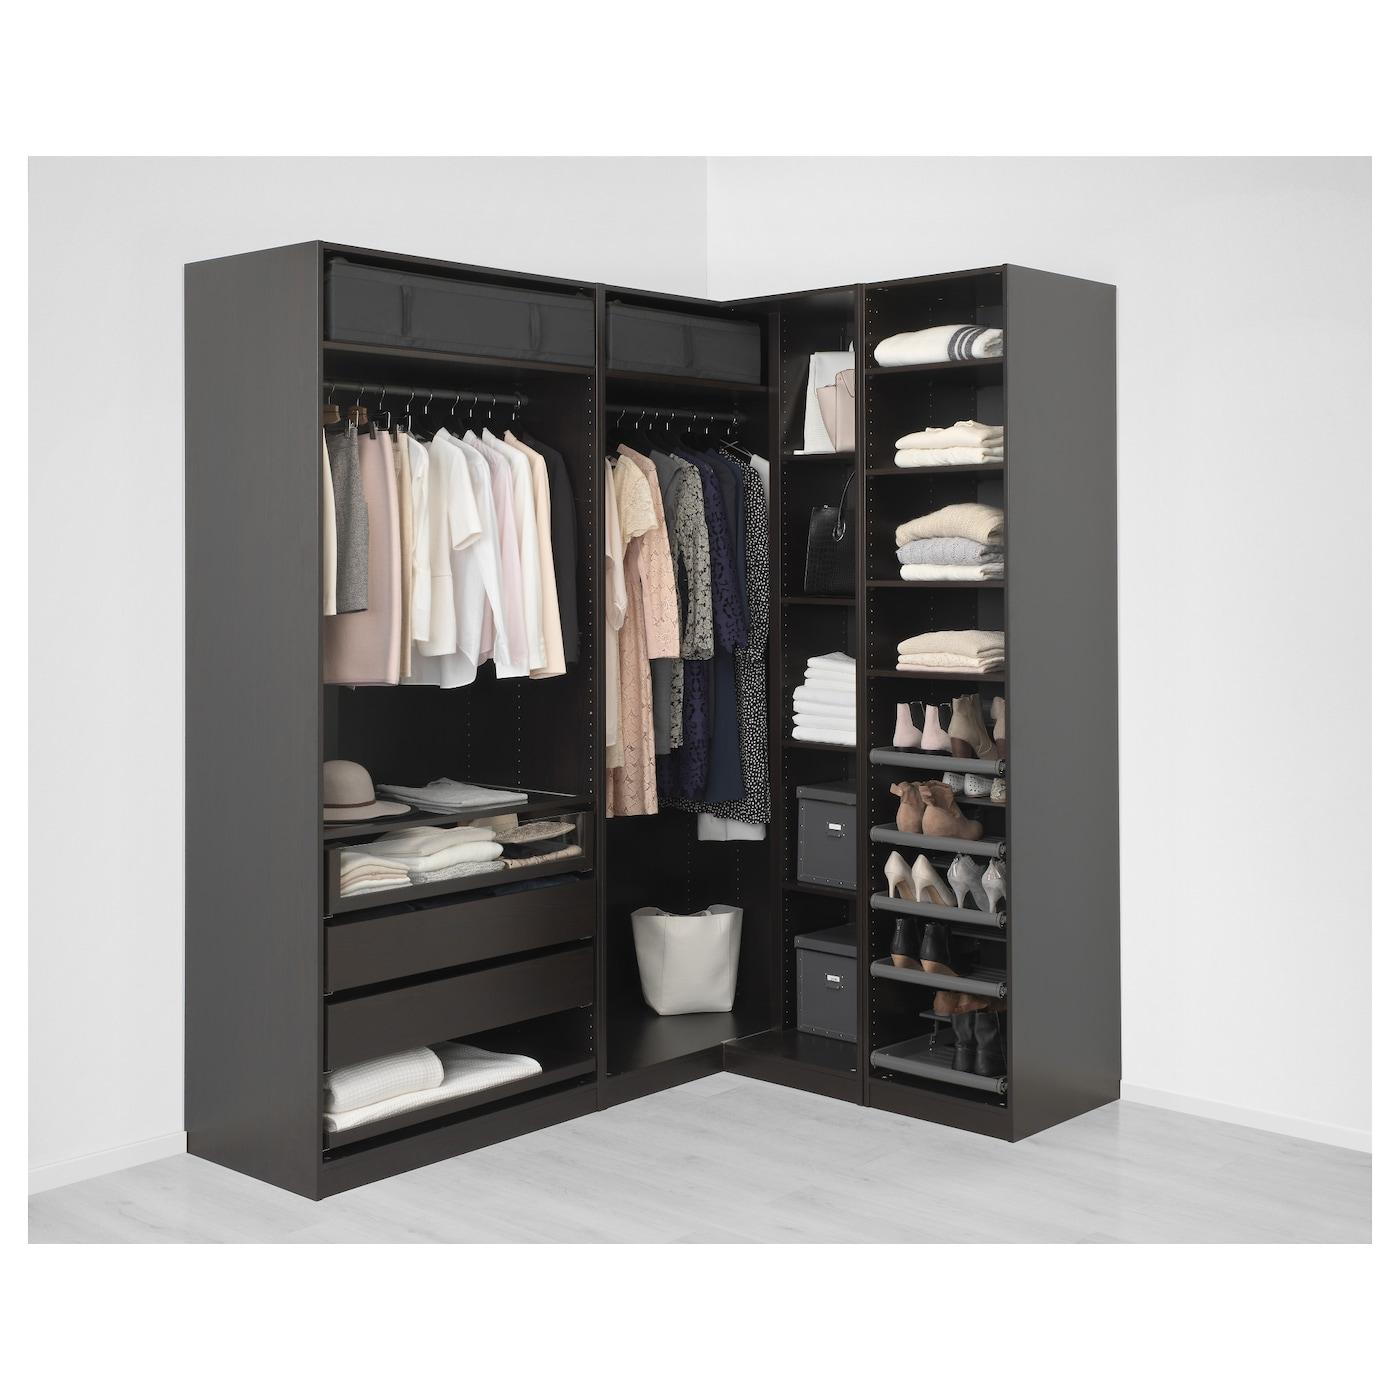 pax add on corner unit with 4 shelves black brown 53 x 35 x 236 cm rh ikea com corner tv unit 2 shelves corner unit bookshelves